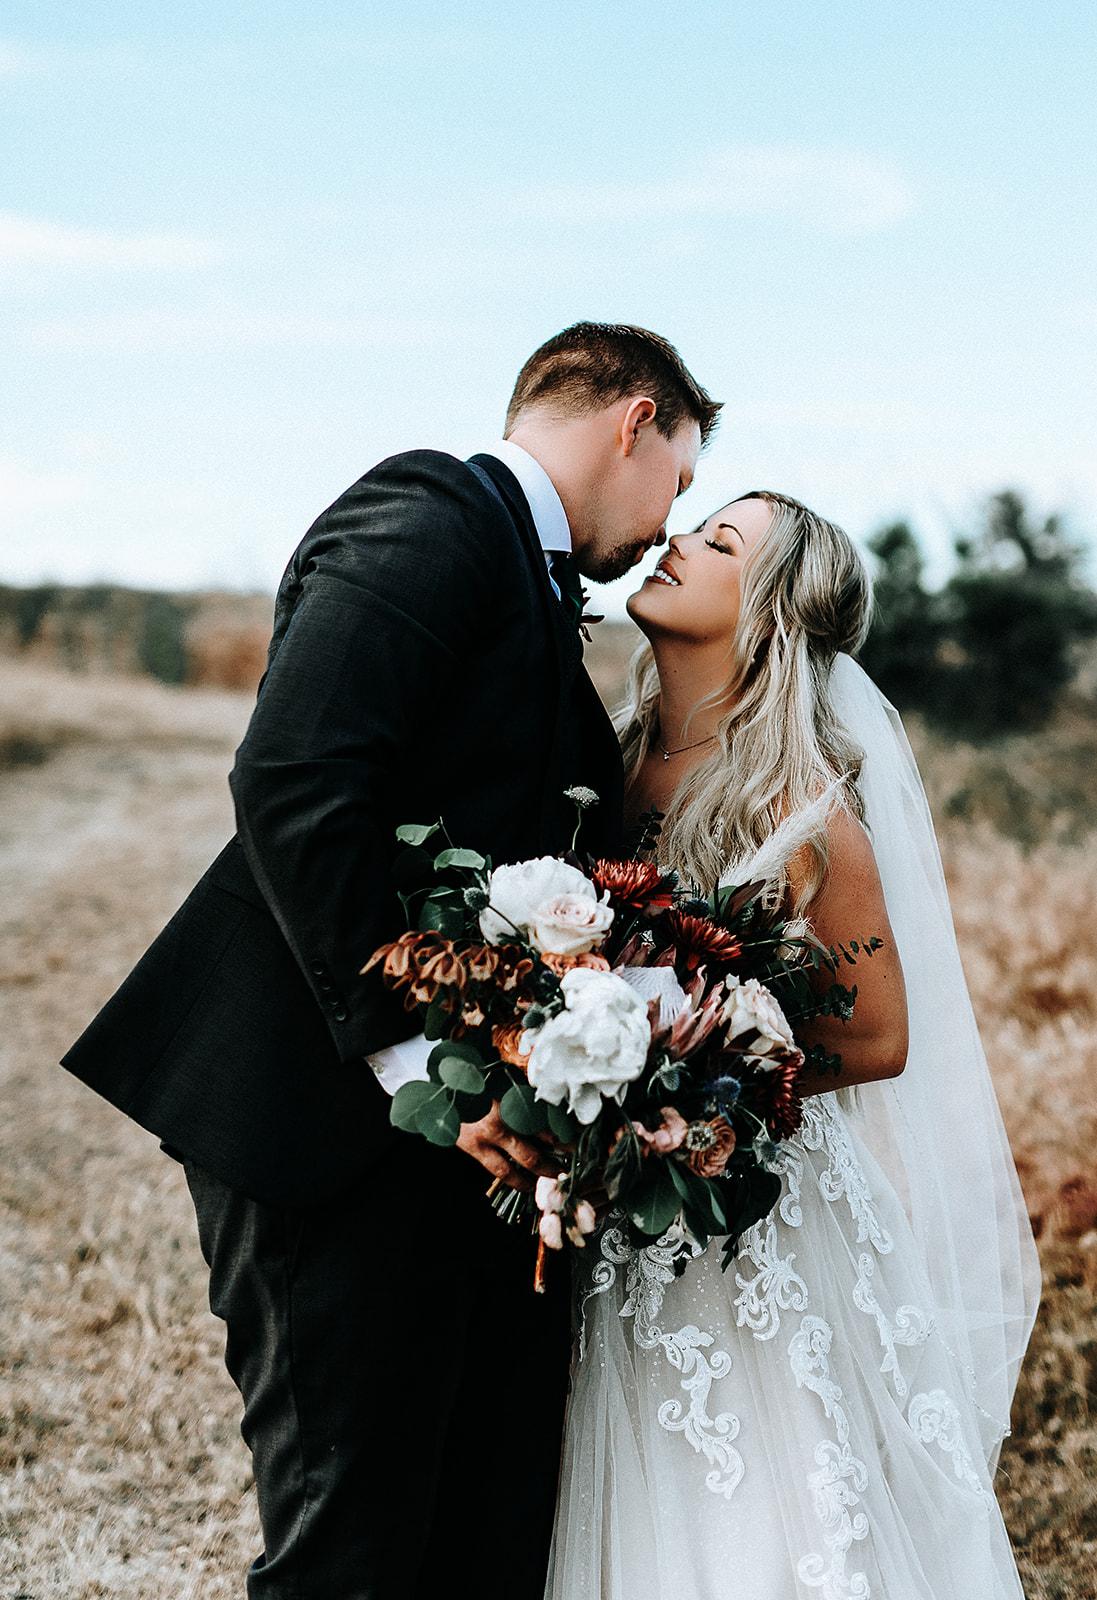 SHADOW LAKE RANCH WEDDING